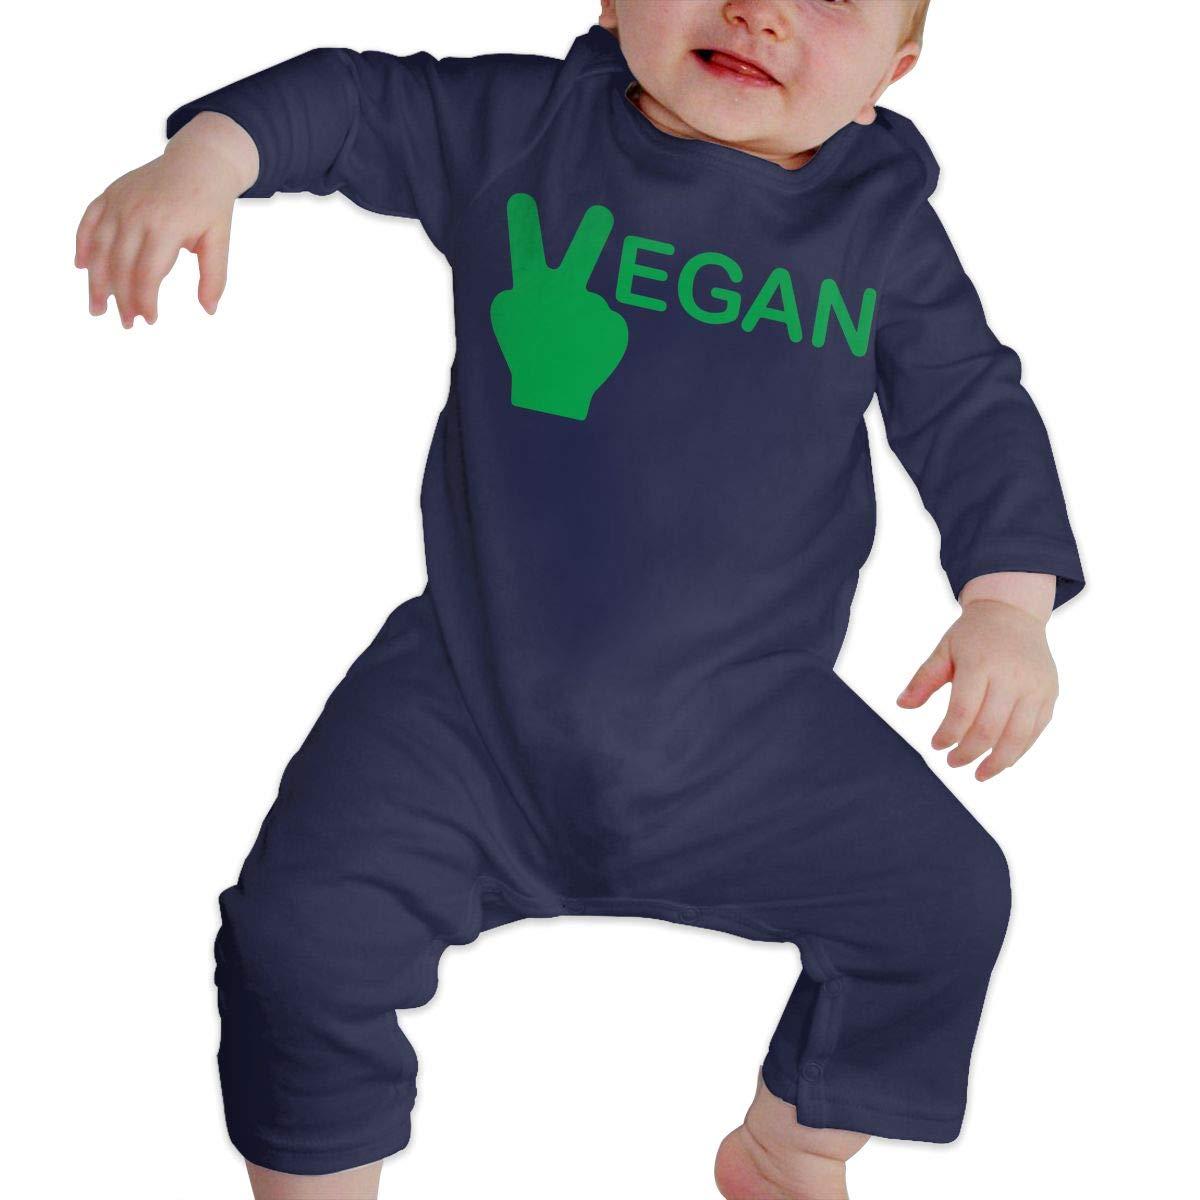 VANMASS Toddler Quints Shark Fishing Short Sleeve Bodysuits\r\nBaby Rompers